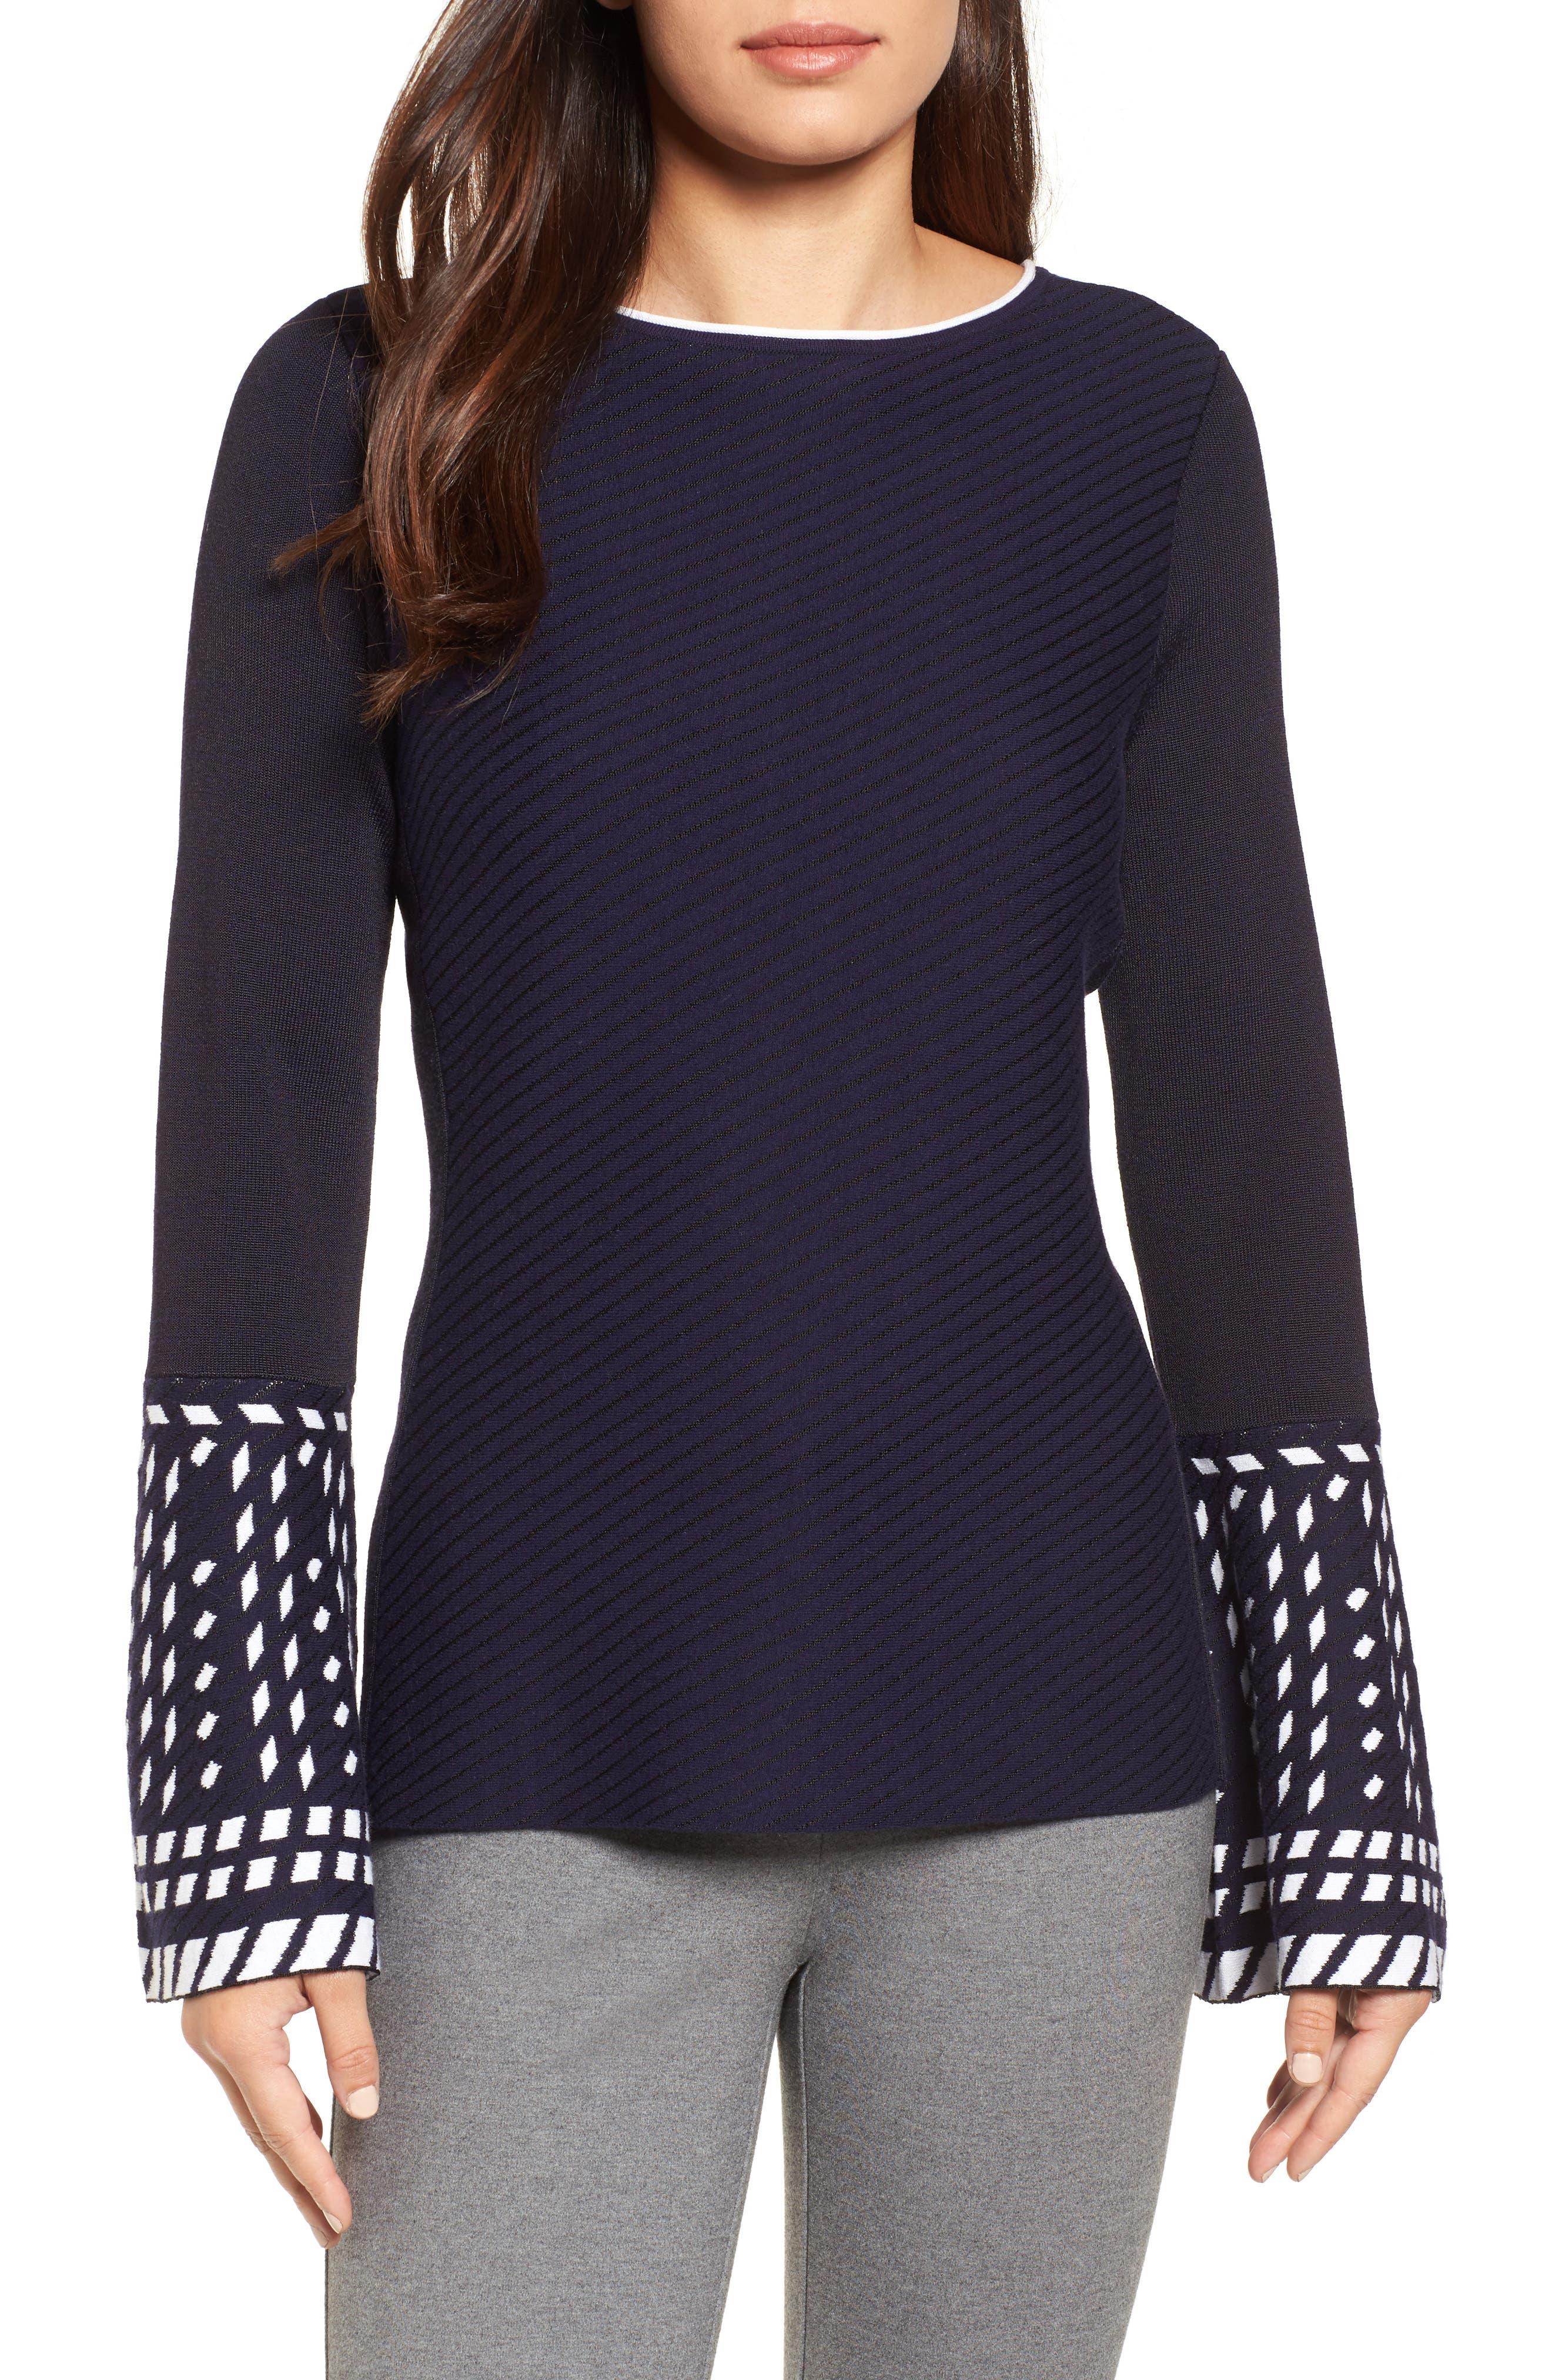 Main Image - NIC+ZOE Falling Star Sweater (Regular & Petite)